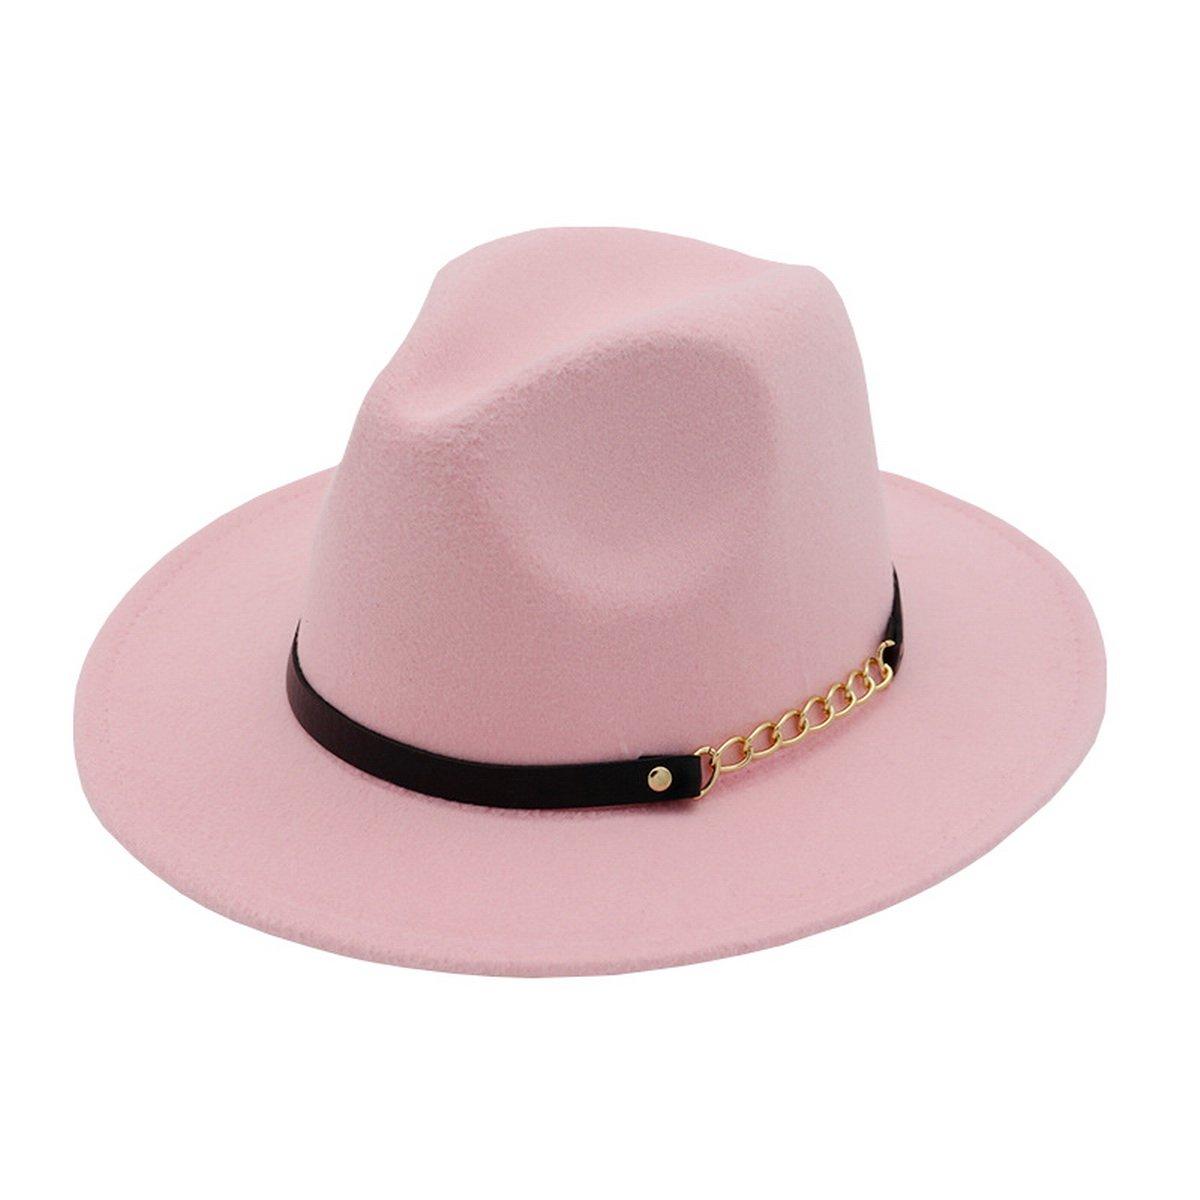 AHATECH Donna Cappello Panama Fedora in Tessuto di Lana Invernale Cappello a Tesa Larga